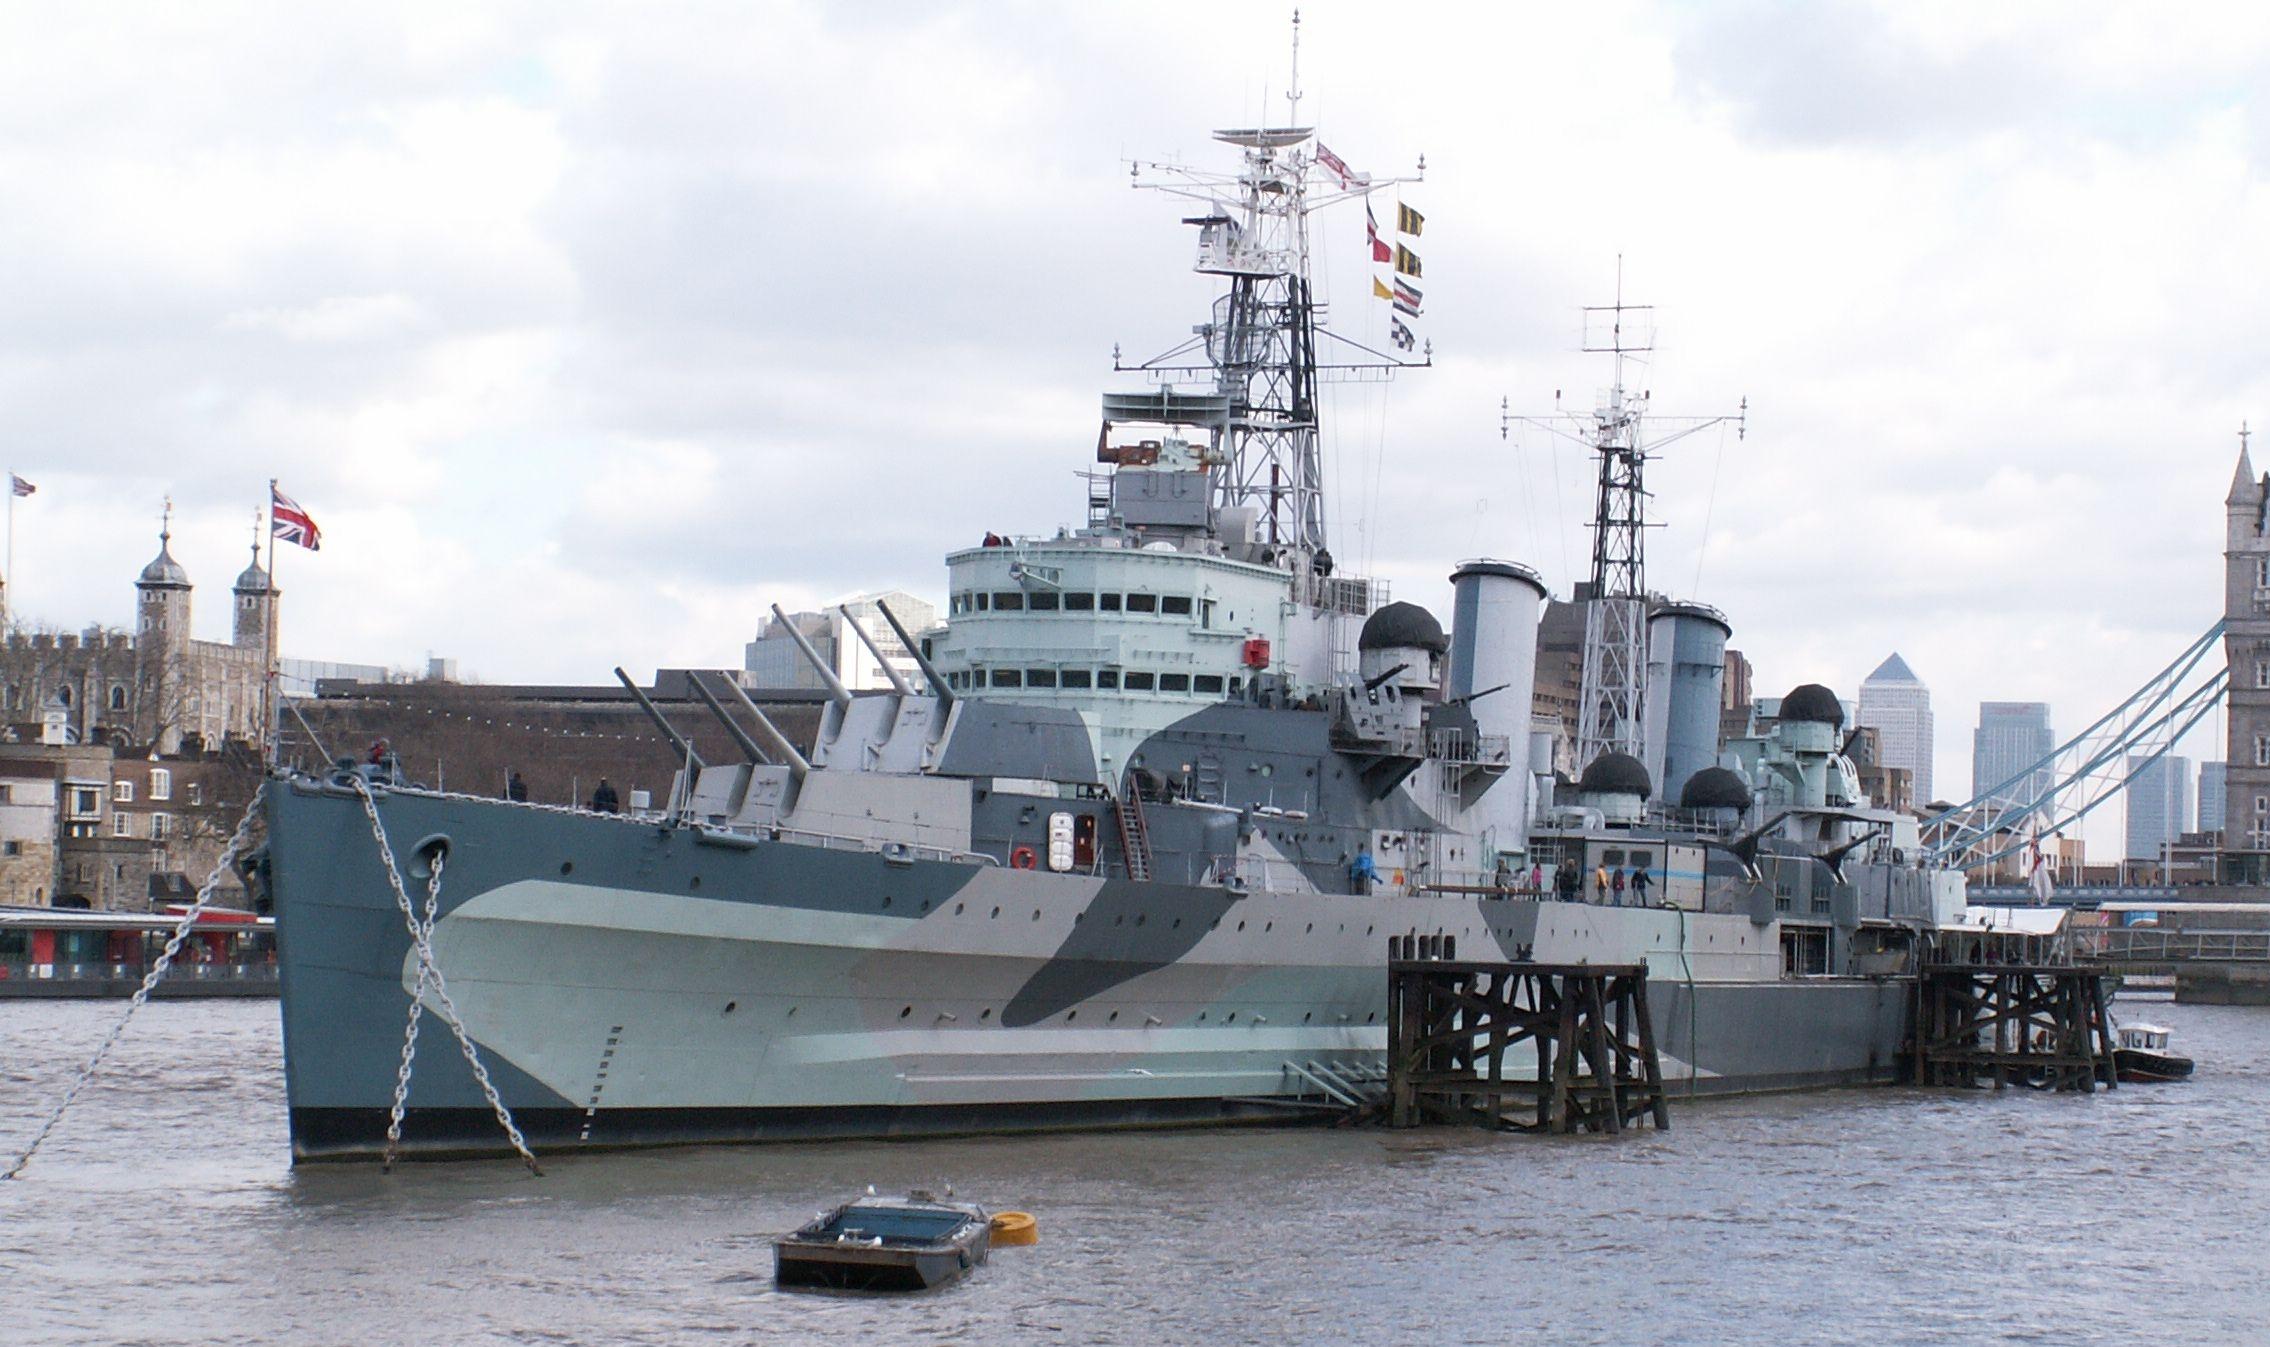 HMS_Belfast_1_db.jpg